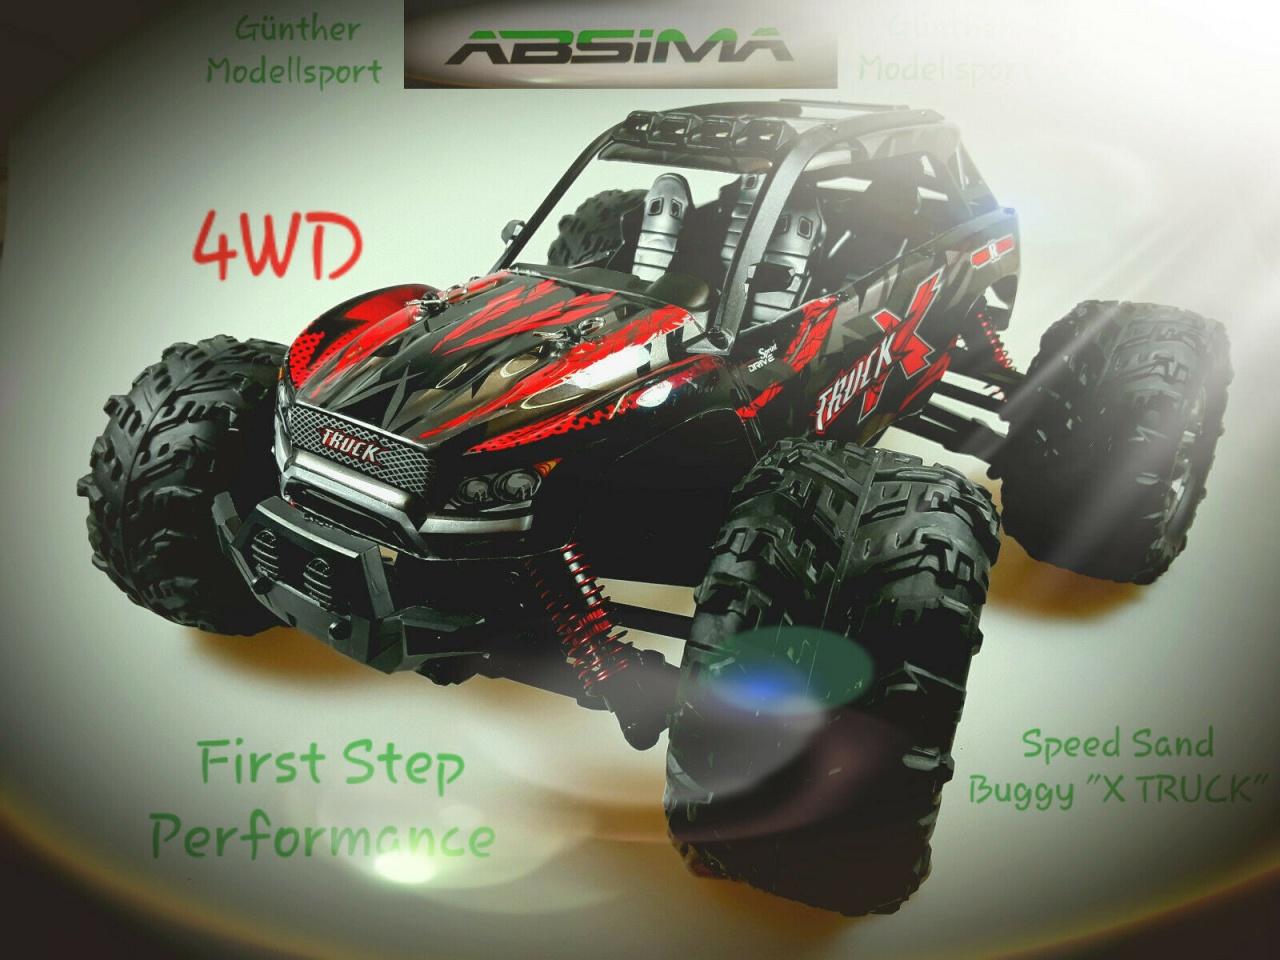 Absima 1:16 Elektro High Speed Sand Buggy X Truck